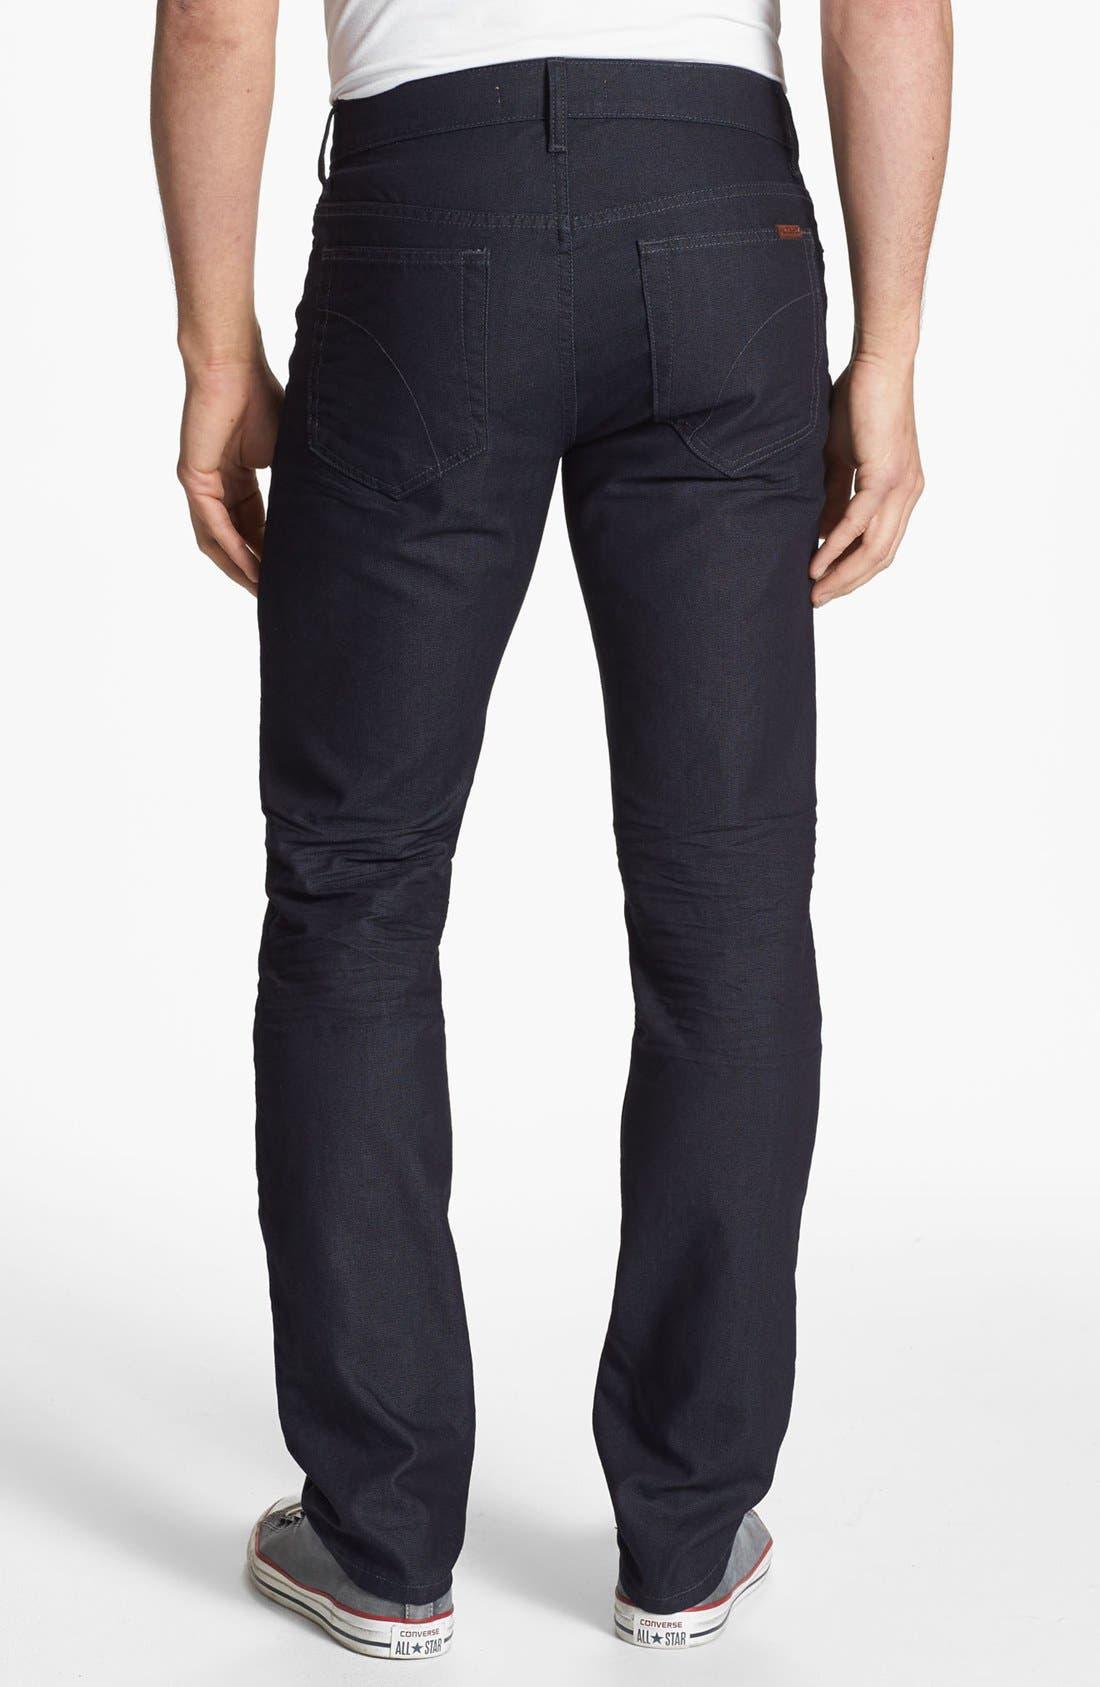 Alternate Image 1 Selected - Joe's 'Brixton' Slim Fit Jeans (Jameson)